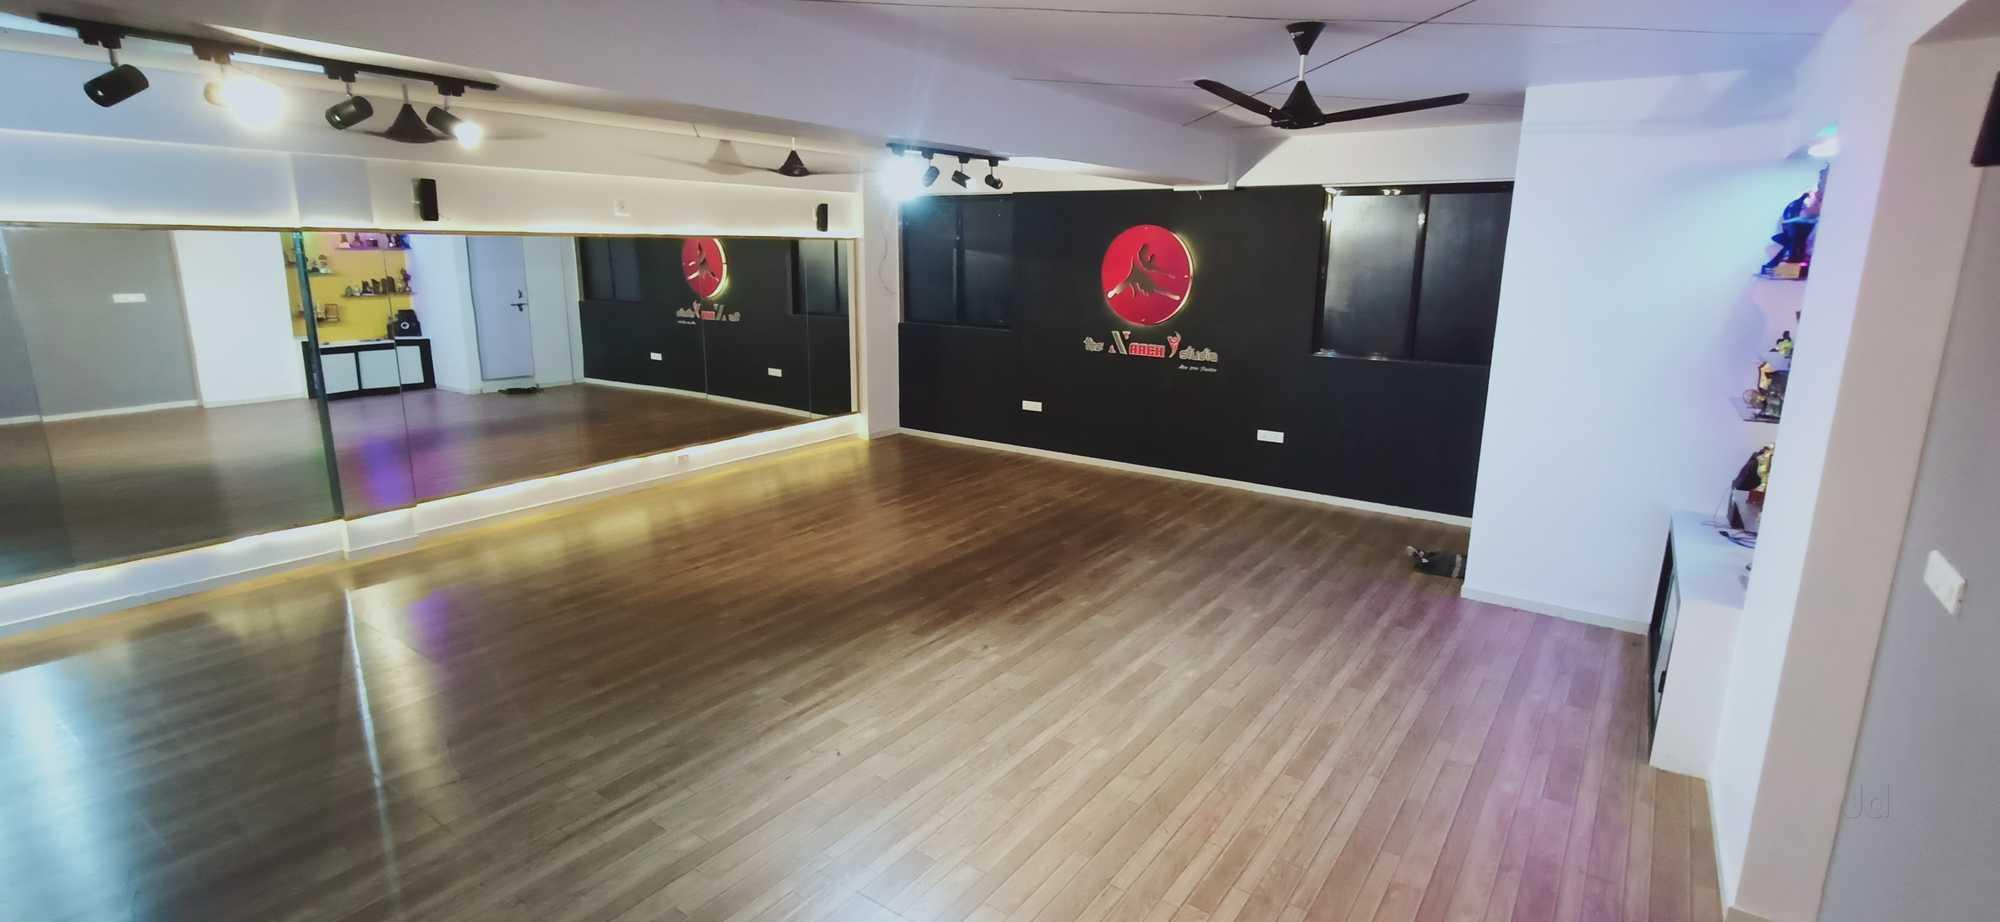 The Naach Studio Vastral